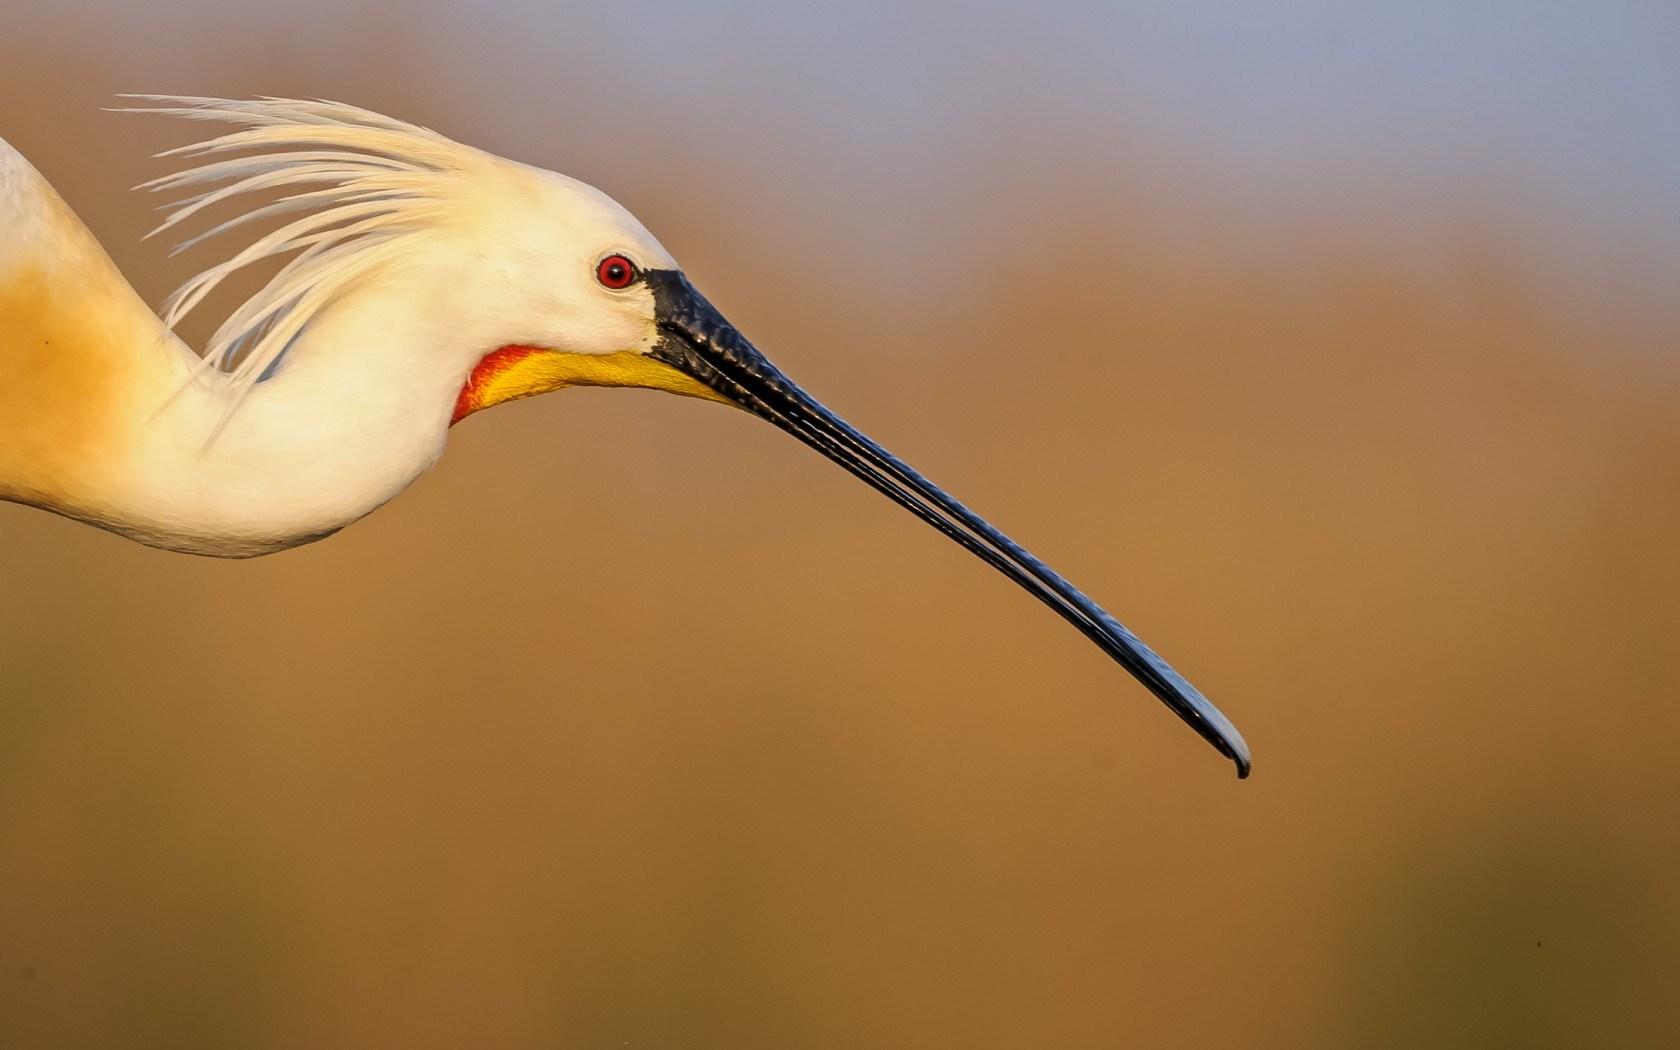 Crane bird wallpapers archives - Animal and bird hd wallpaper ...